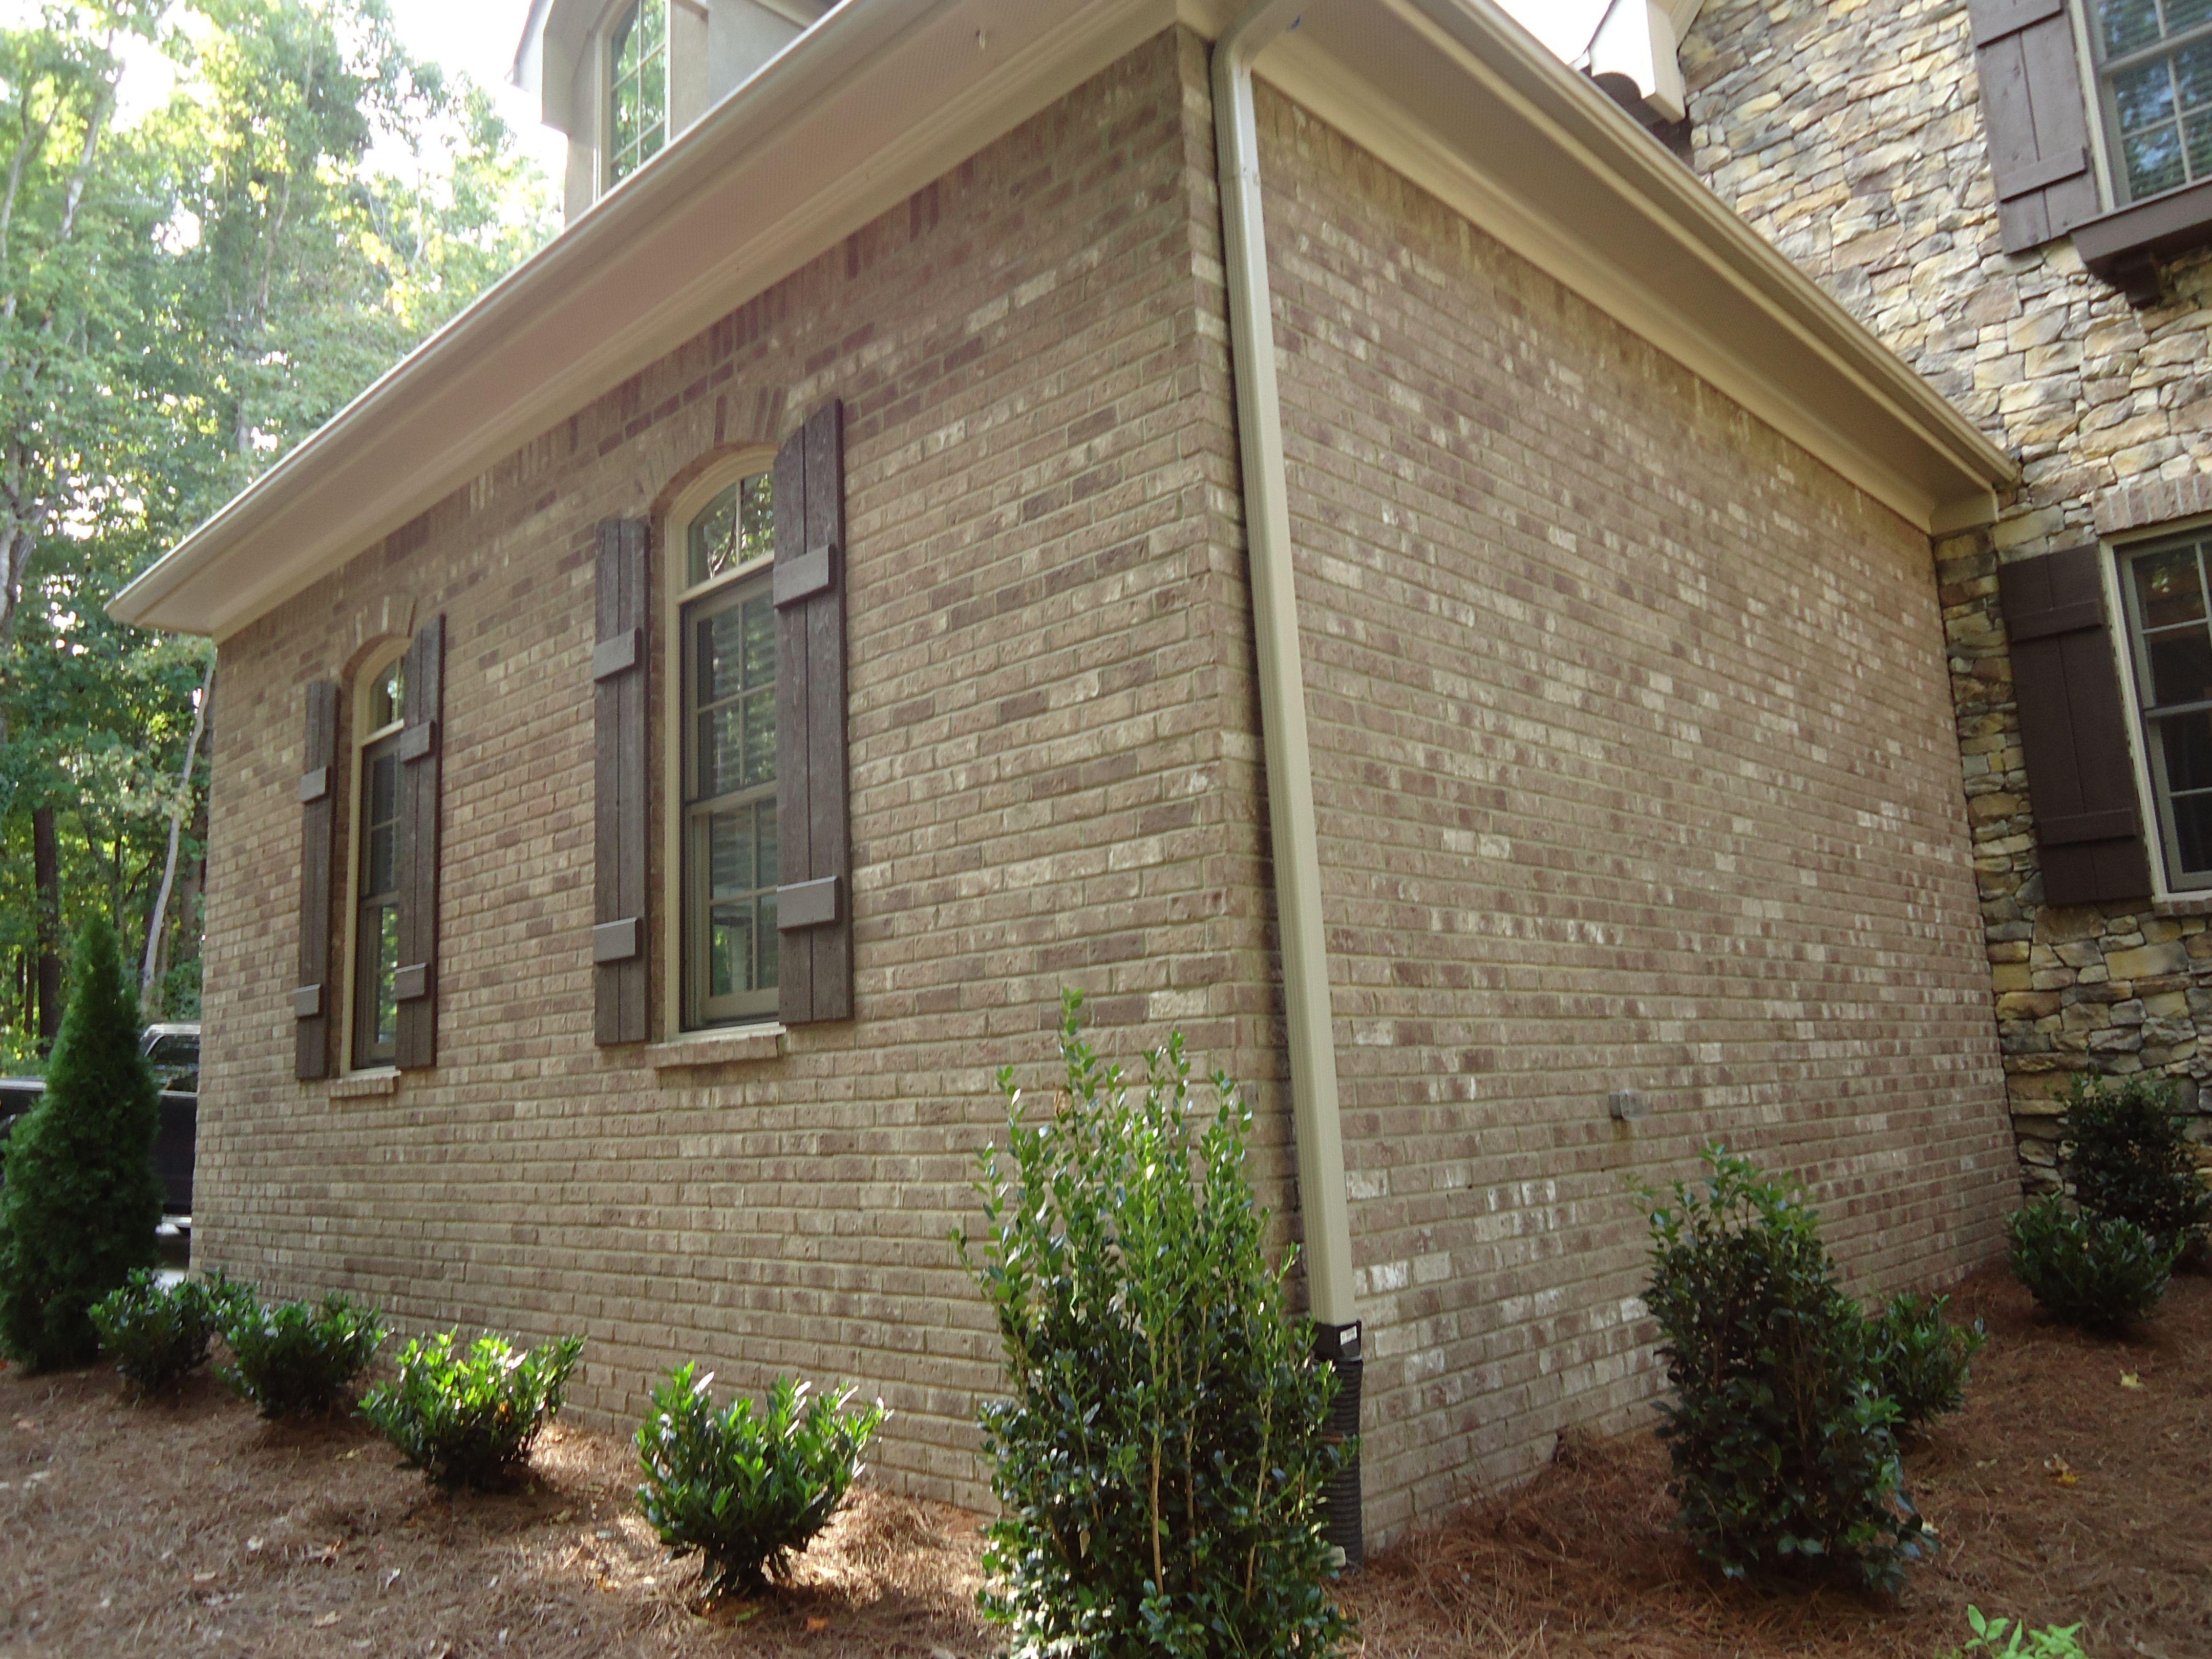 Arh Asheville Plan Exterior 30 Brick Boral Savannah Gray Shutters Spicewood Sw3021 Stone Coronado F Exterior Brick American Houses House Exterior